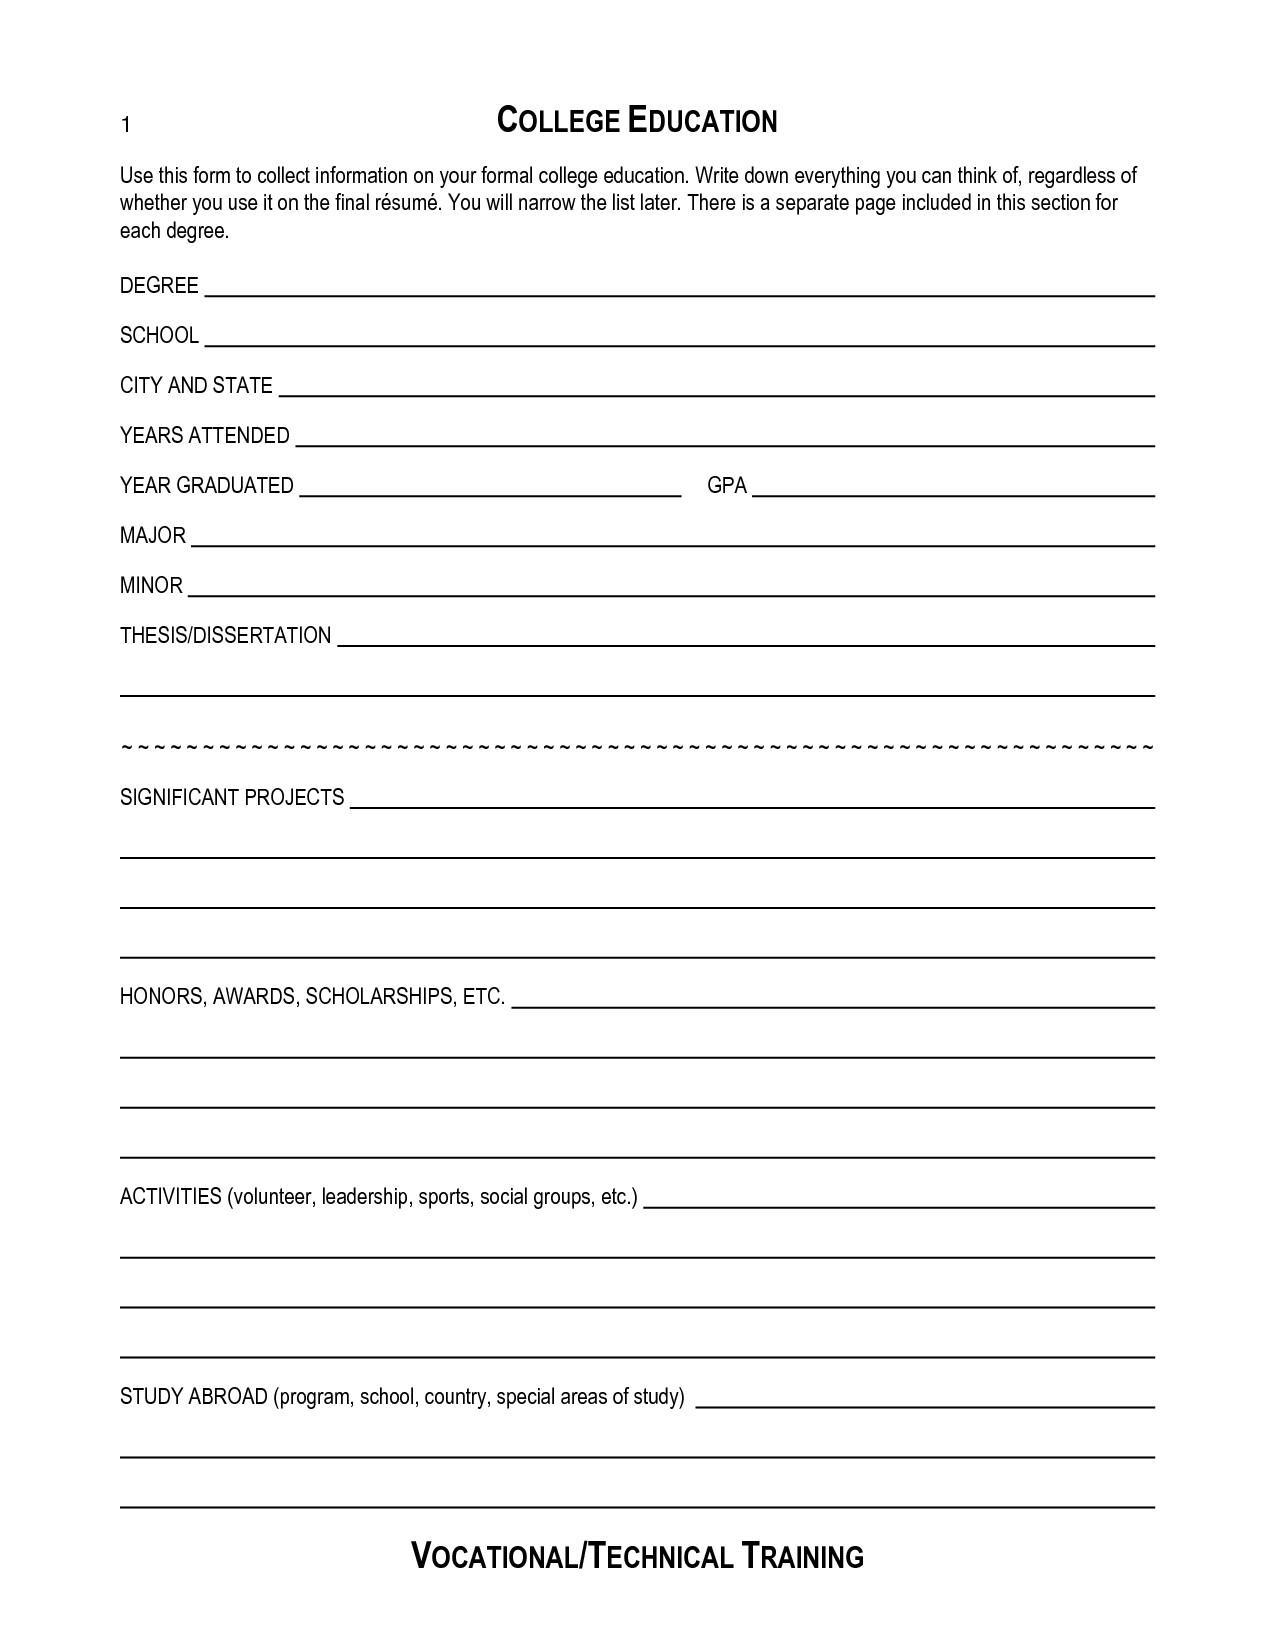 Free Blank Resume Templates To Print